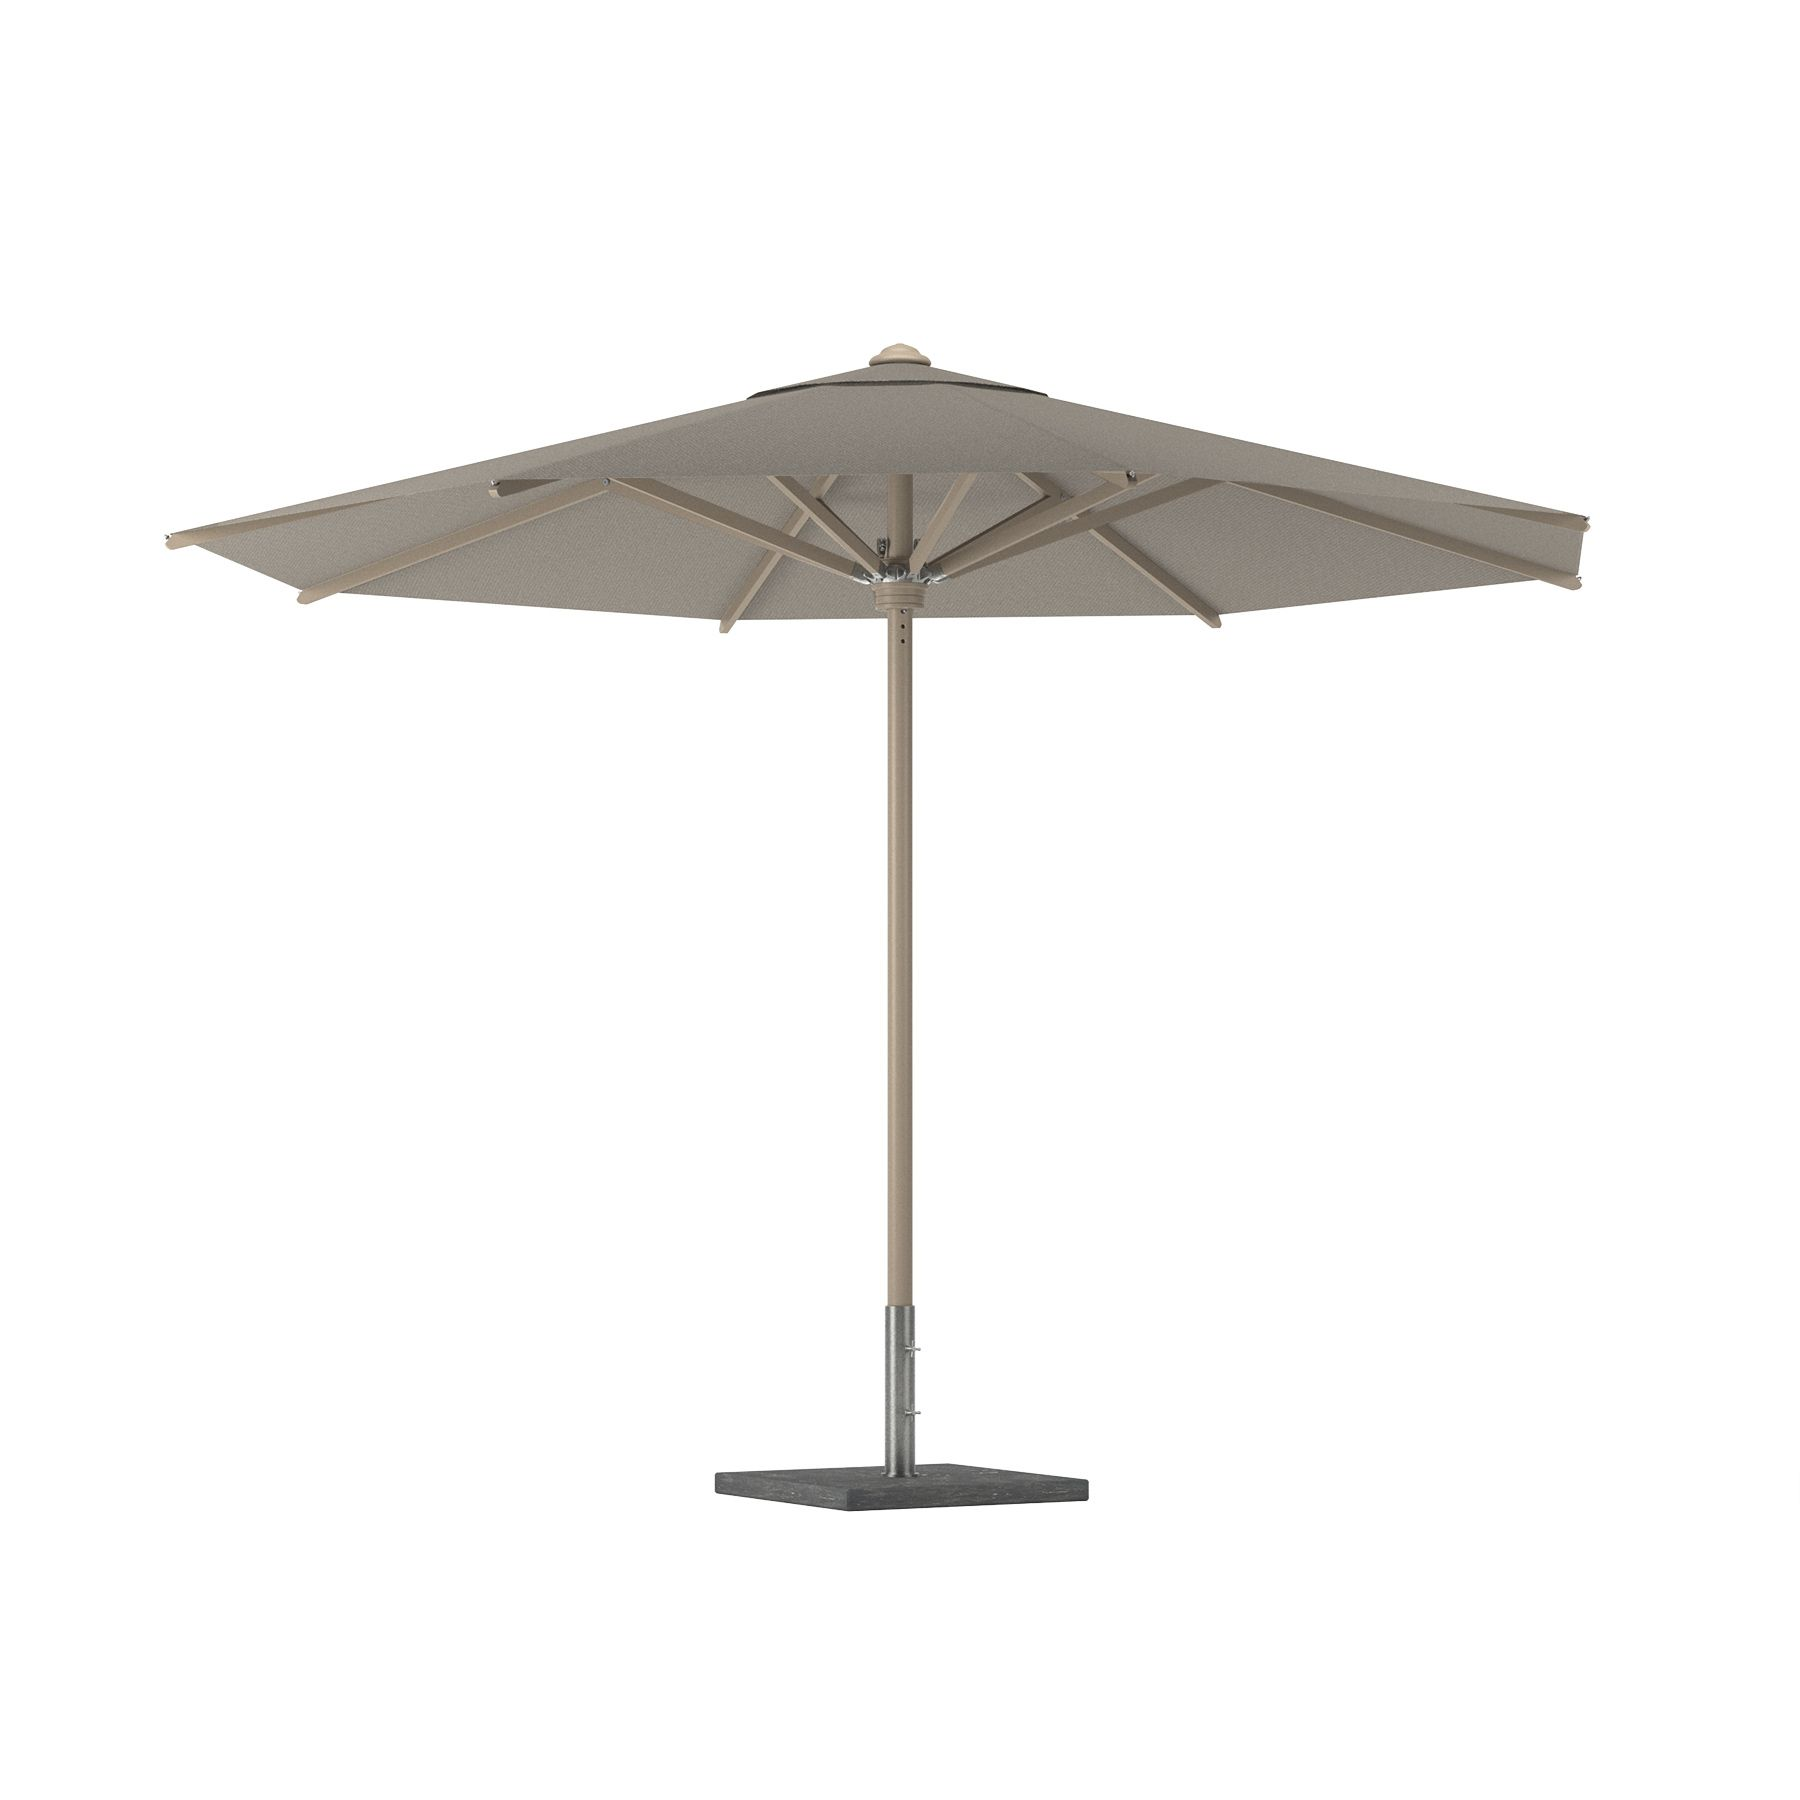 explore outdoor umbrella outdoor furniture and more sha alu royal botania